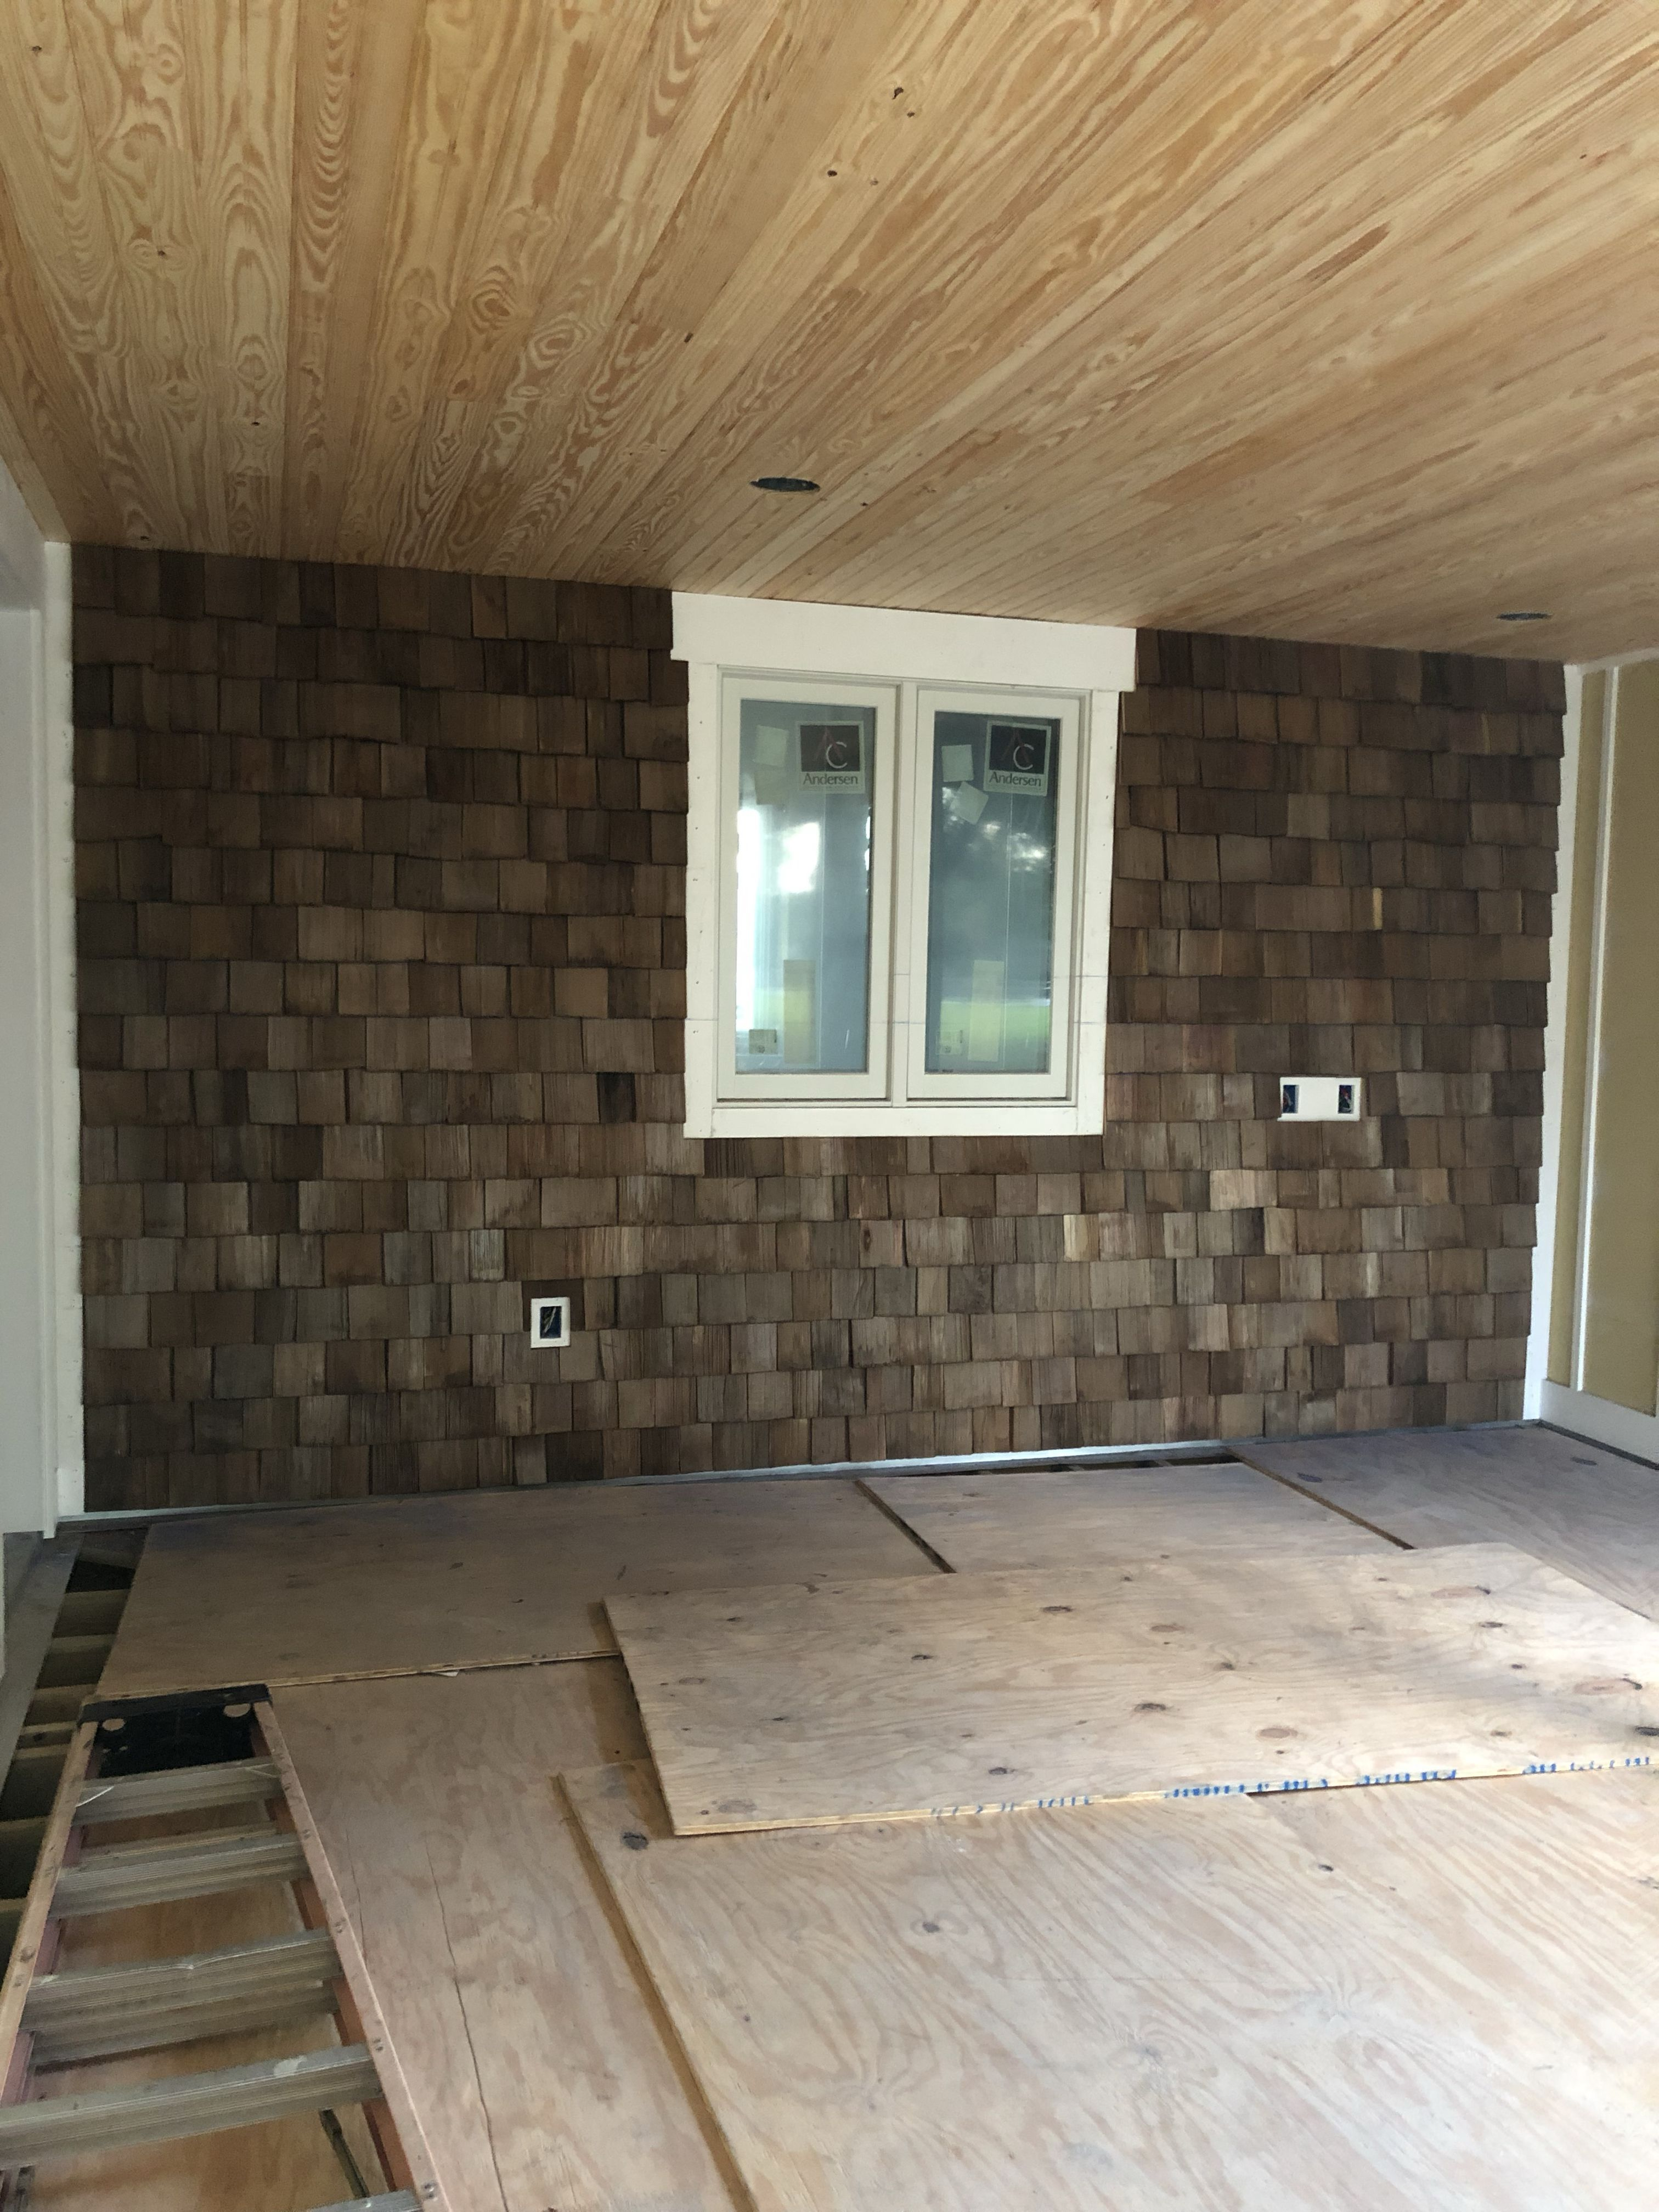 Best Use Cedar As An Accent Wall On Your Farmhouse In 2020 400 x 300